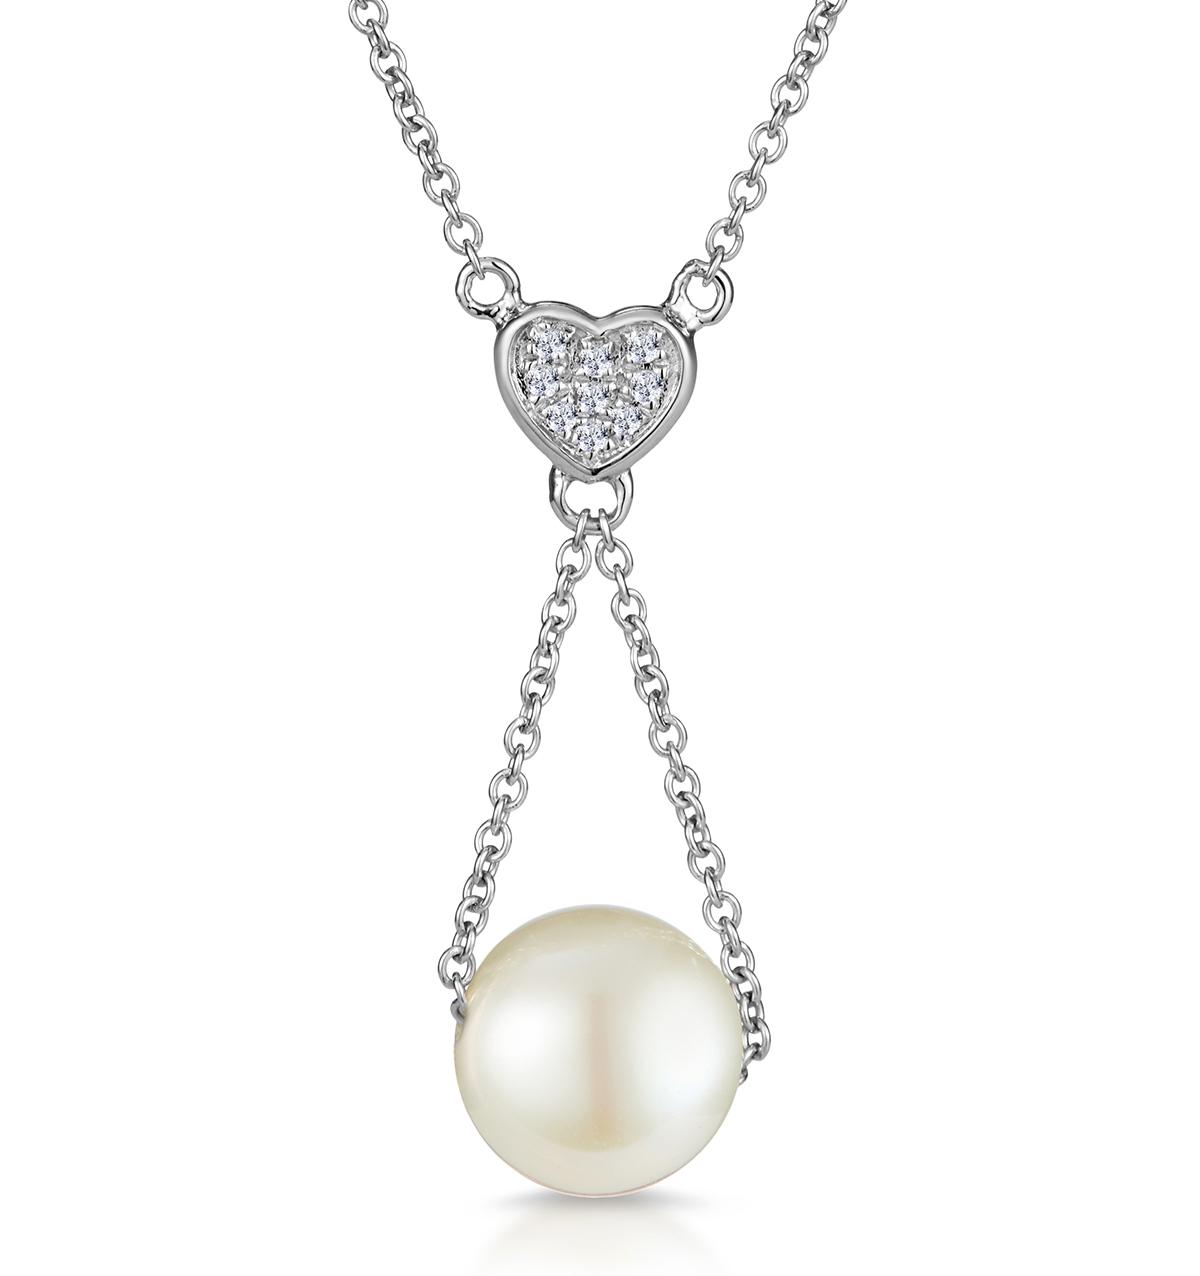 PEARL AND DIAMOND HEART STELLATO NECKLACE IN 9K WHITE GOLD